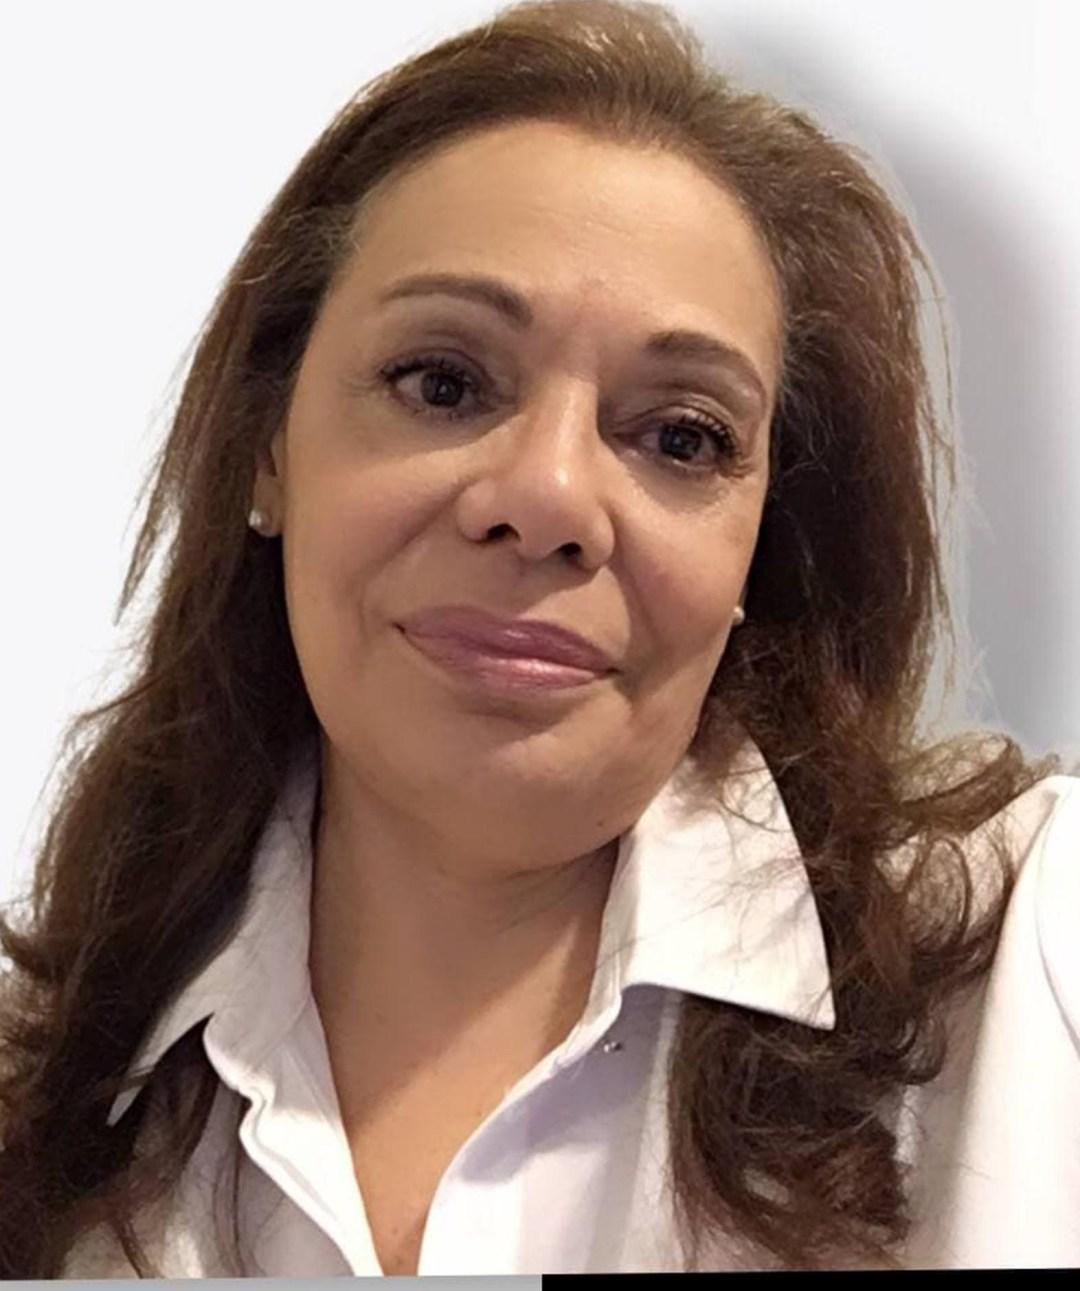 Norma Pacheco